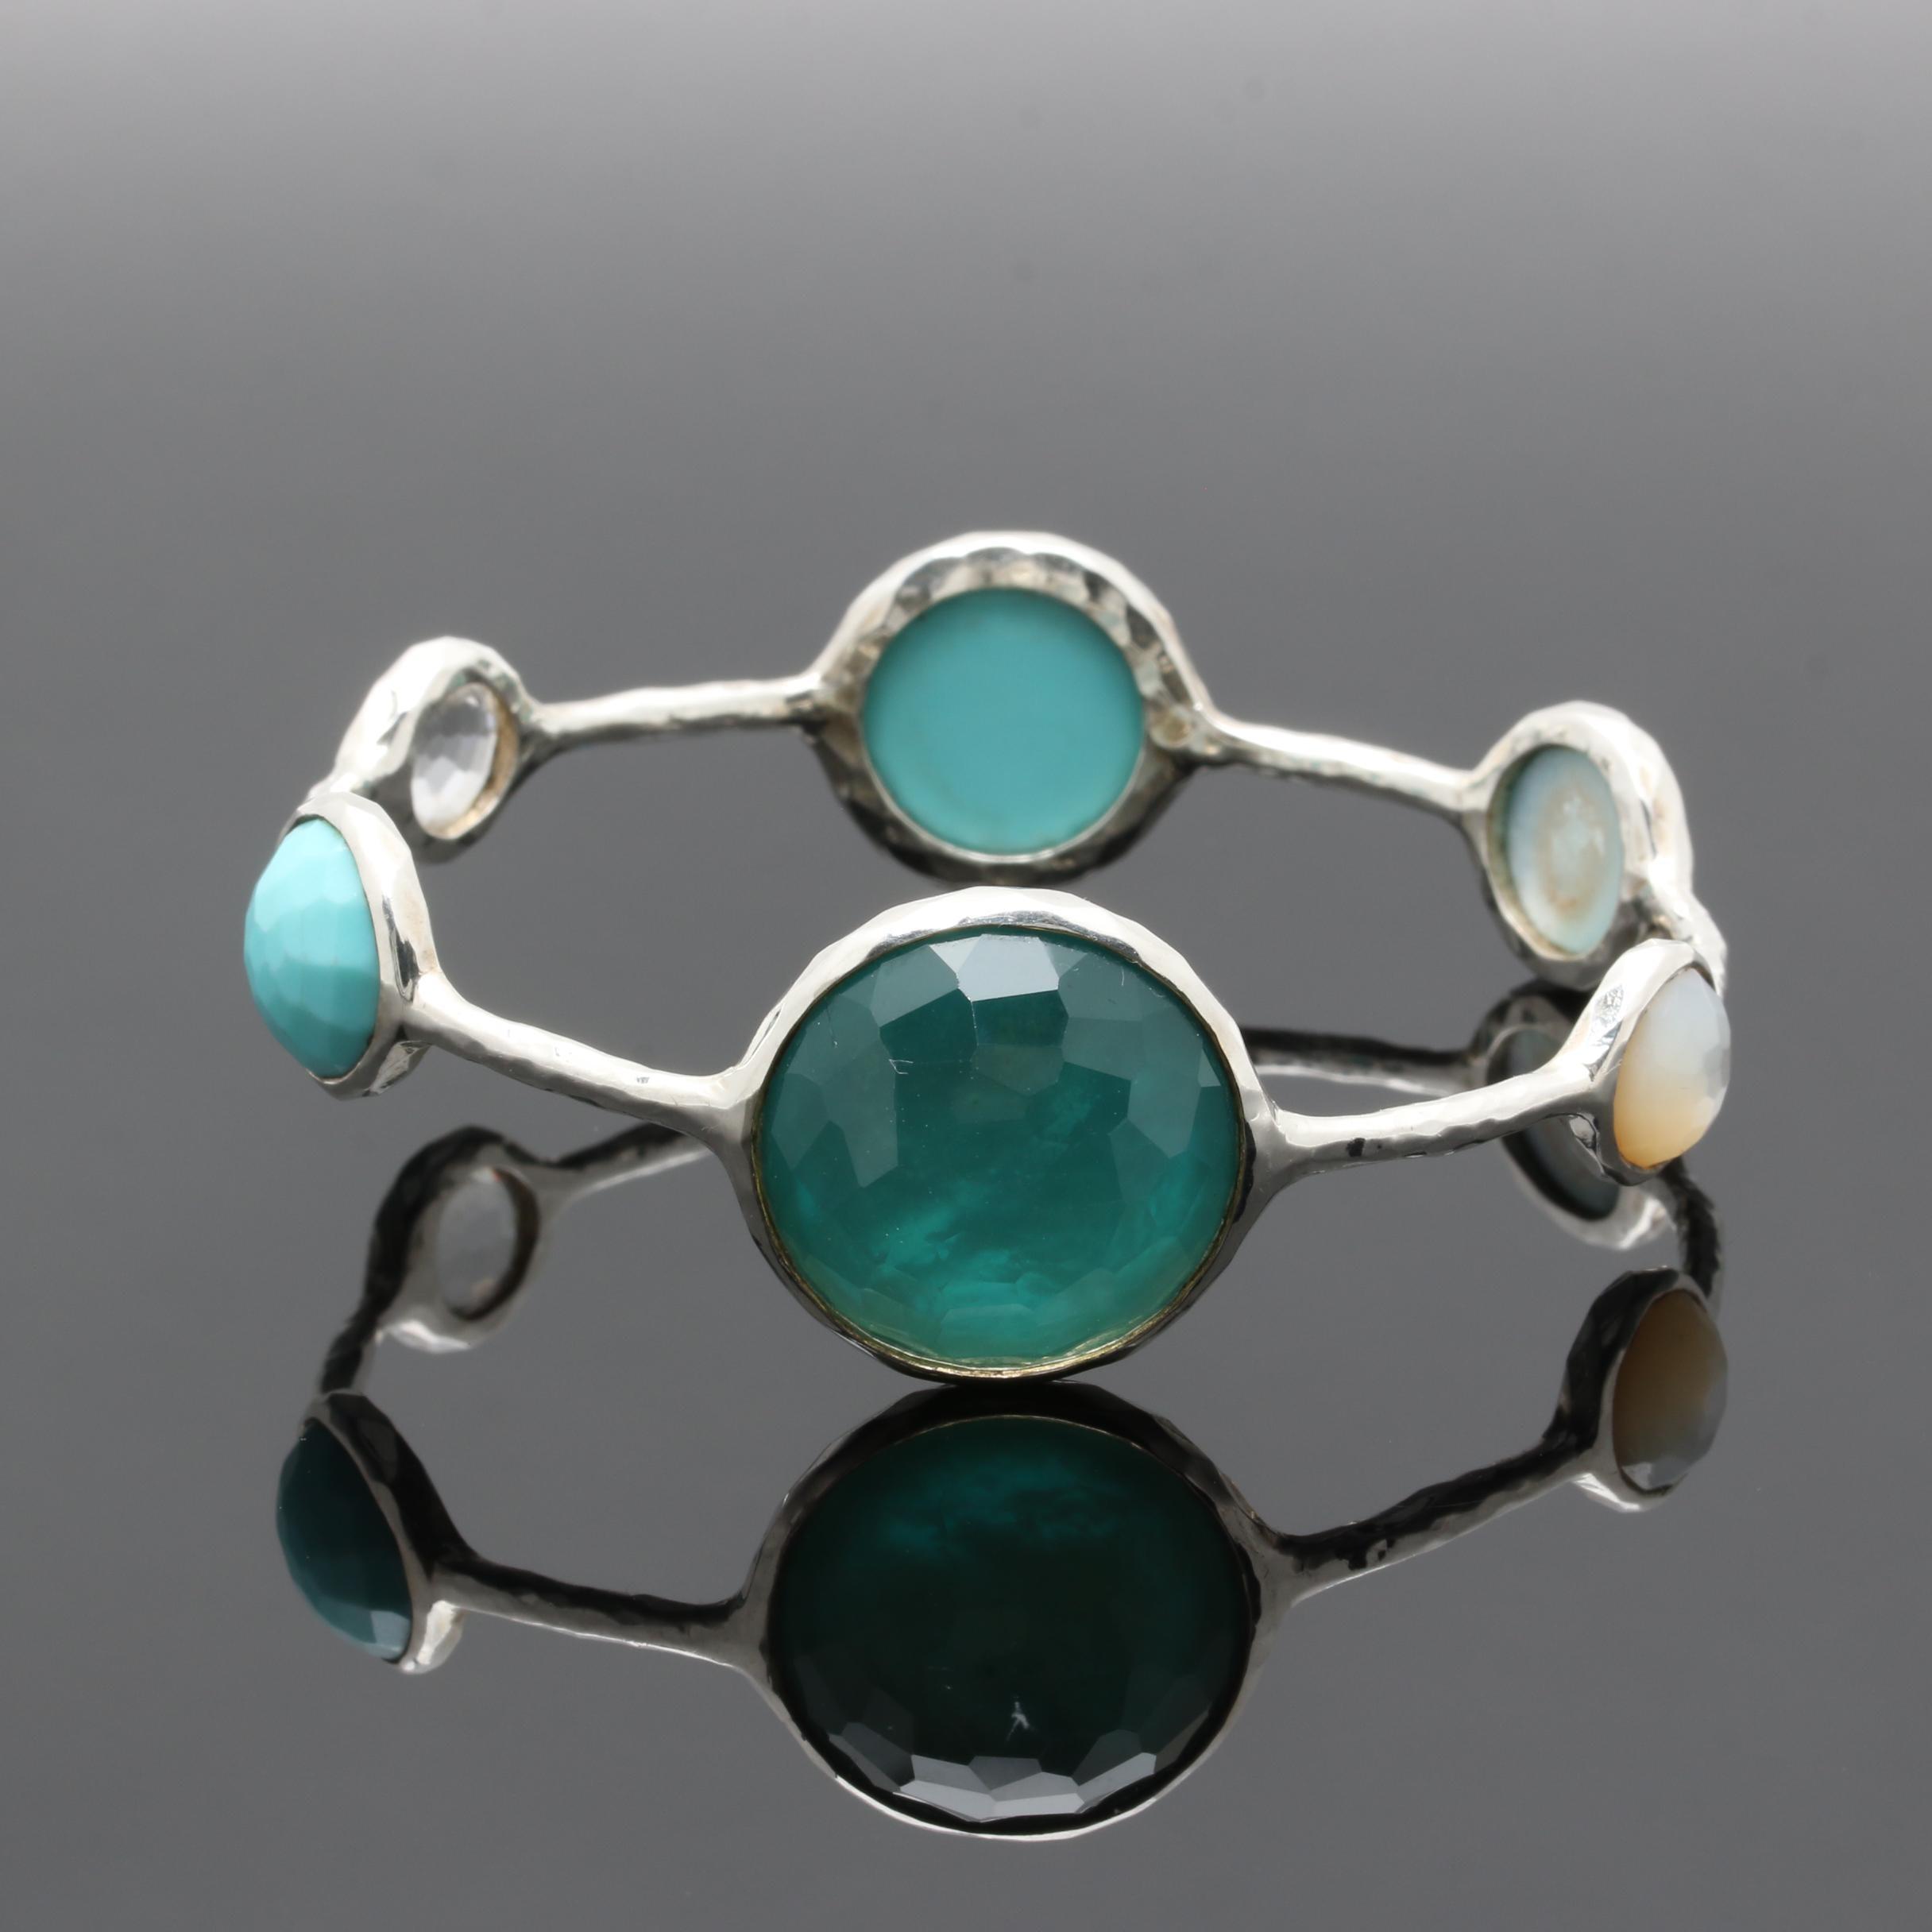 Ippolita Sterling Silver Gemstone Bangle Bracelet Including Quartz